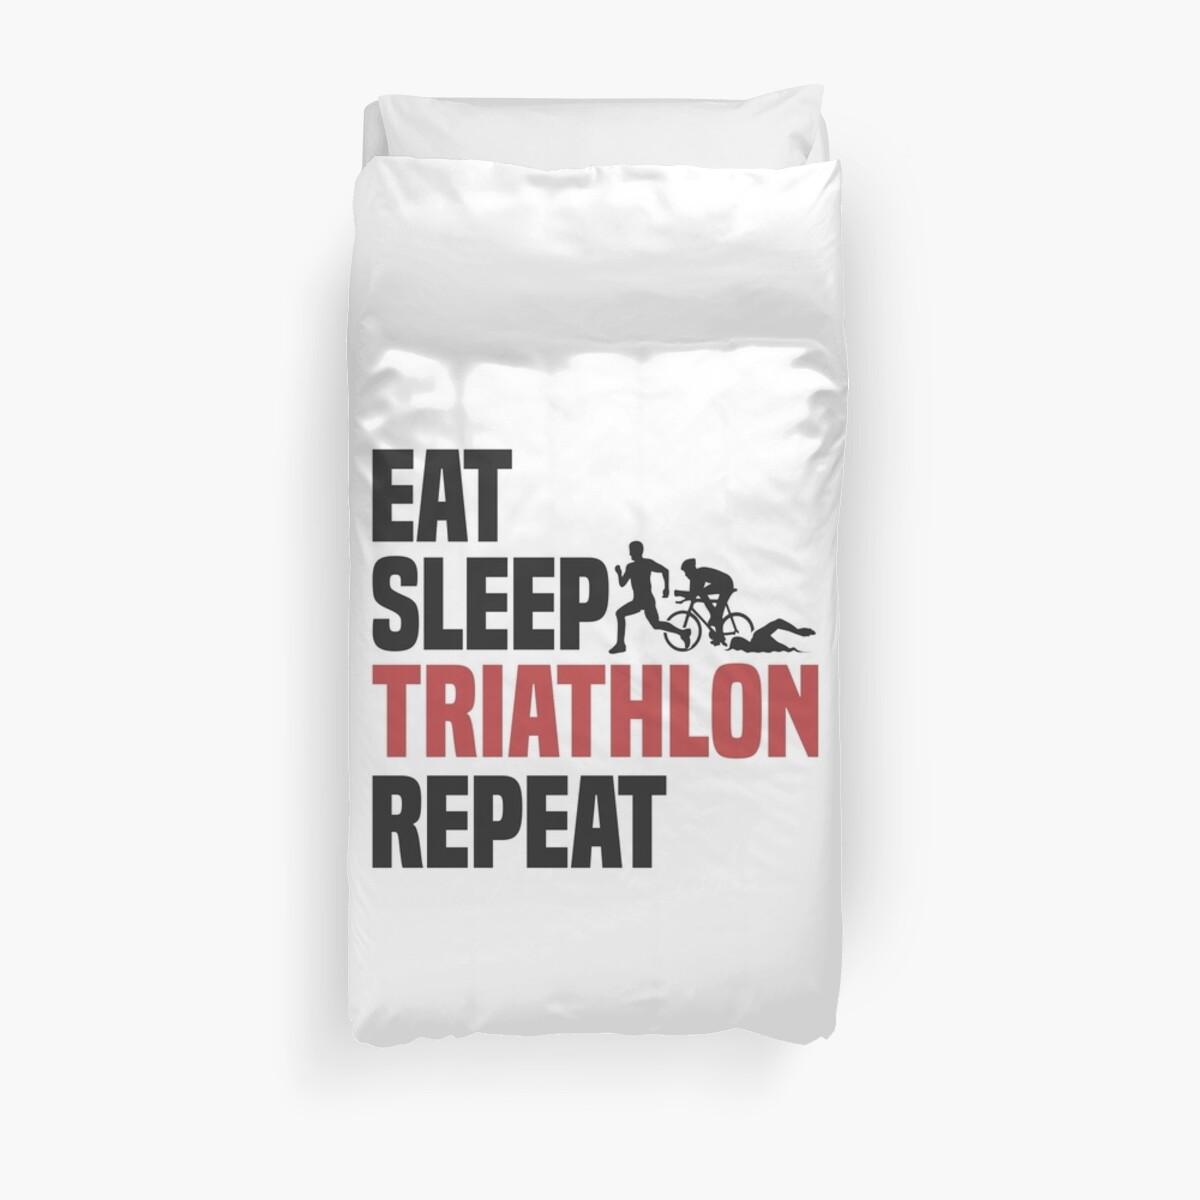 Eat Sleep Triathlon Repeat T-Shirt - Cool Funny Nerdy Comic Graphic ...